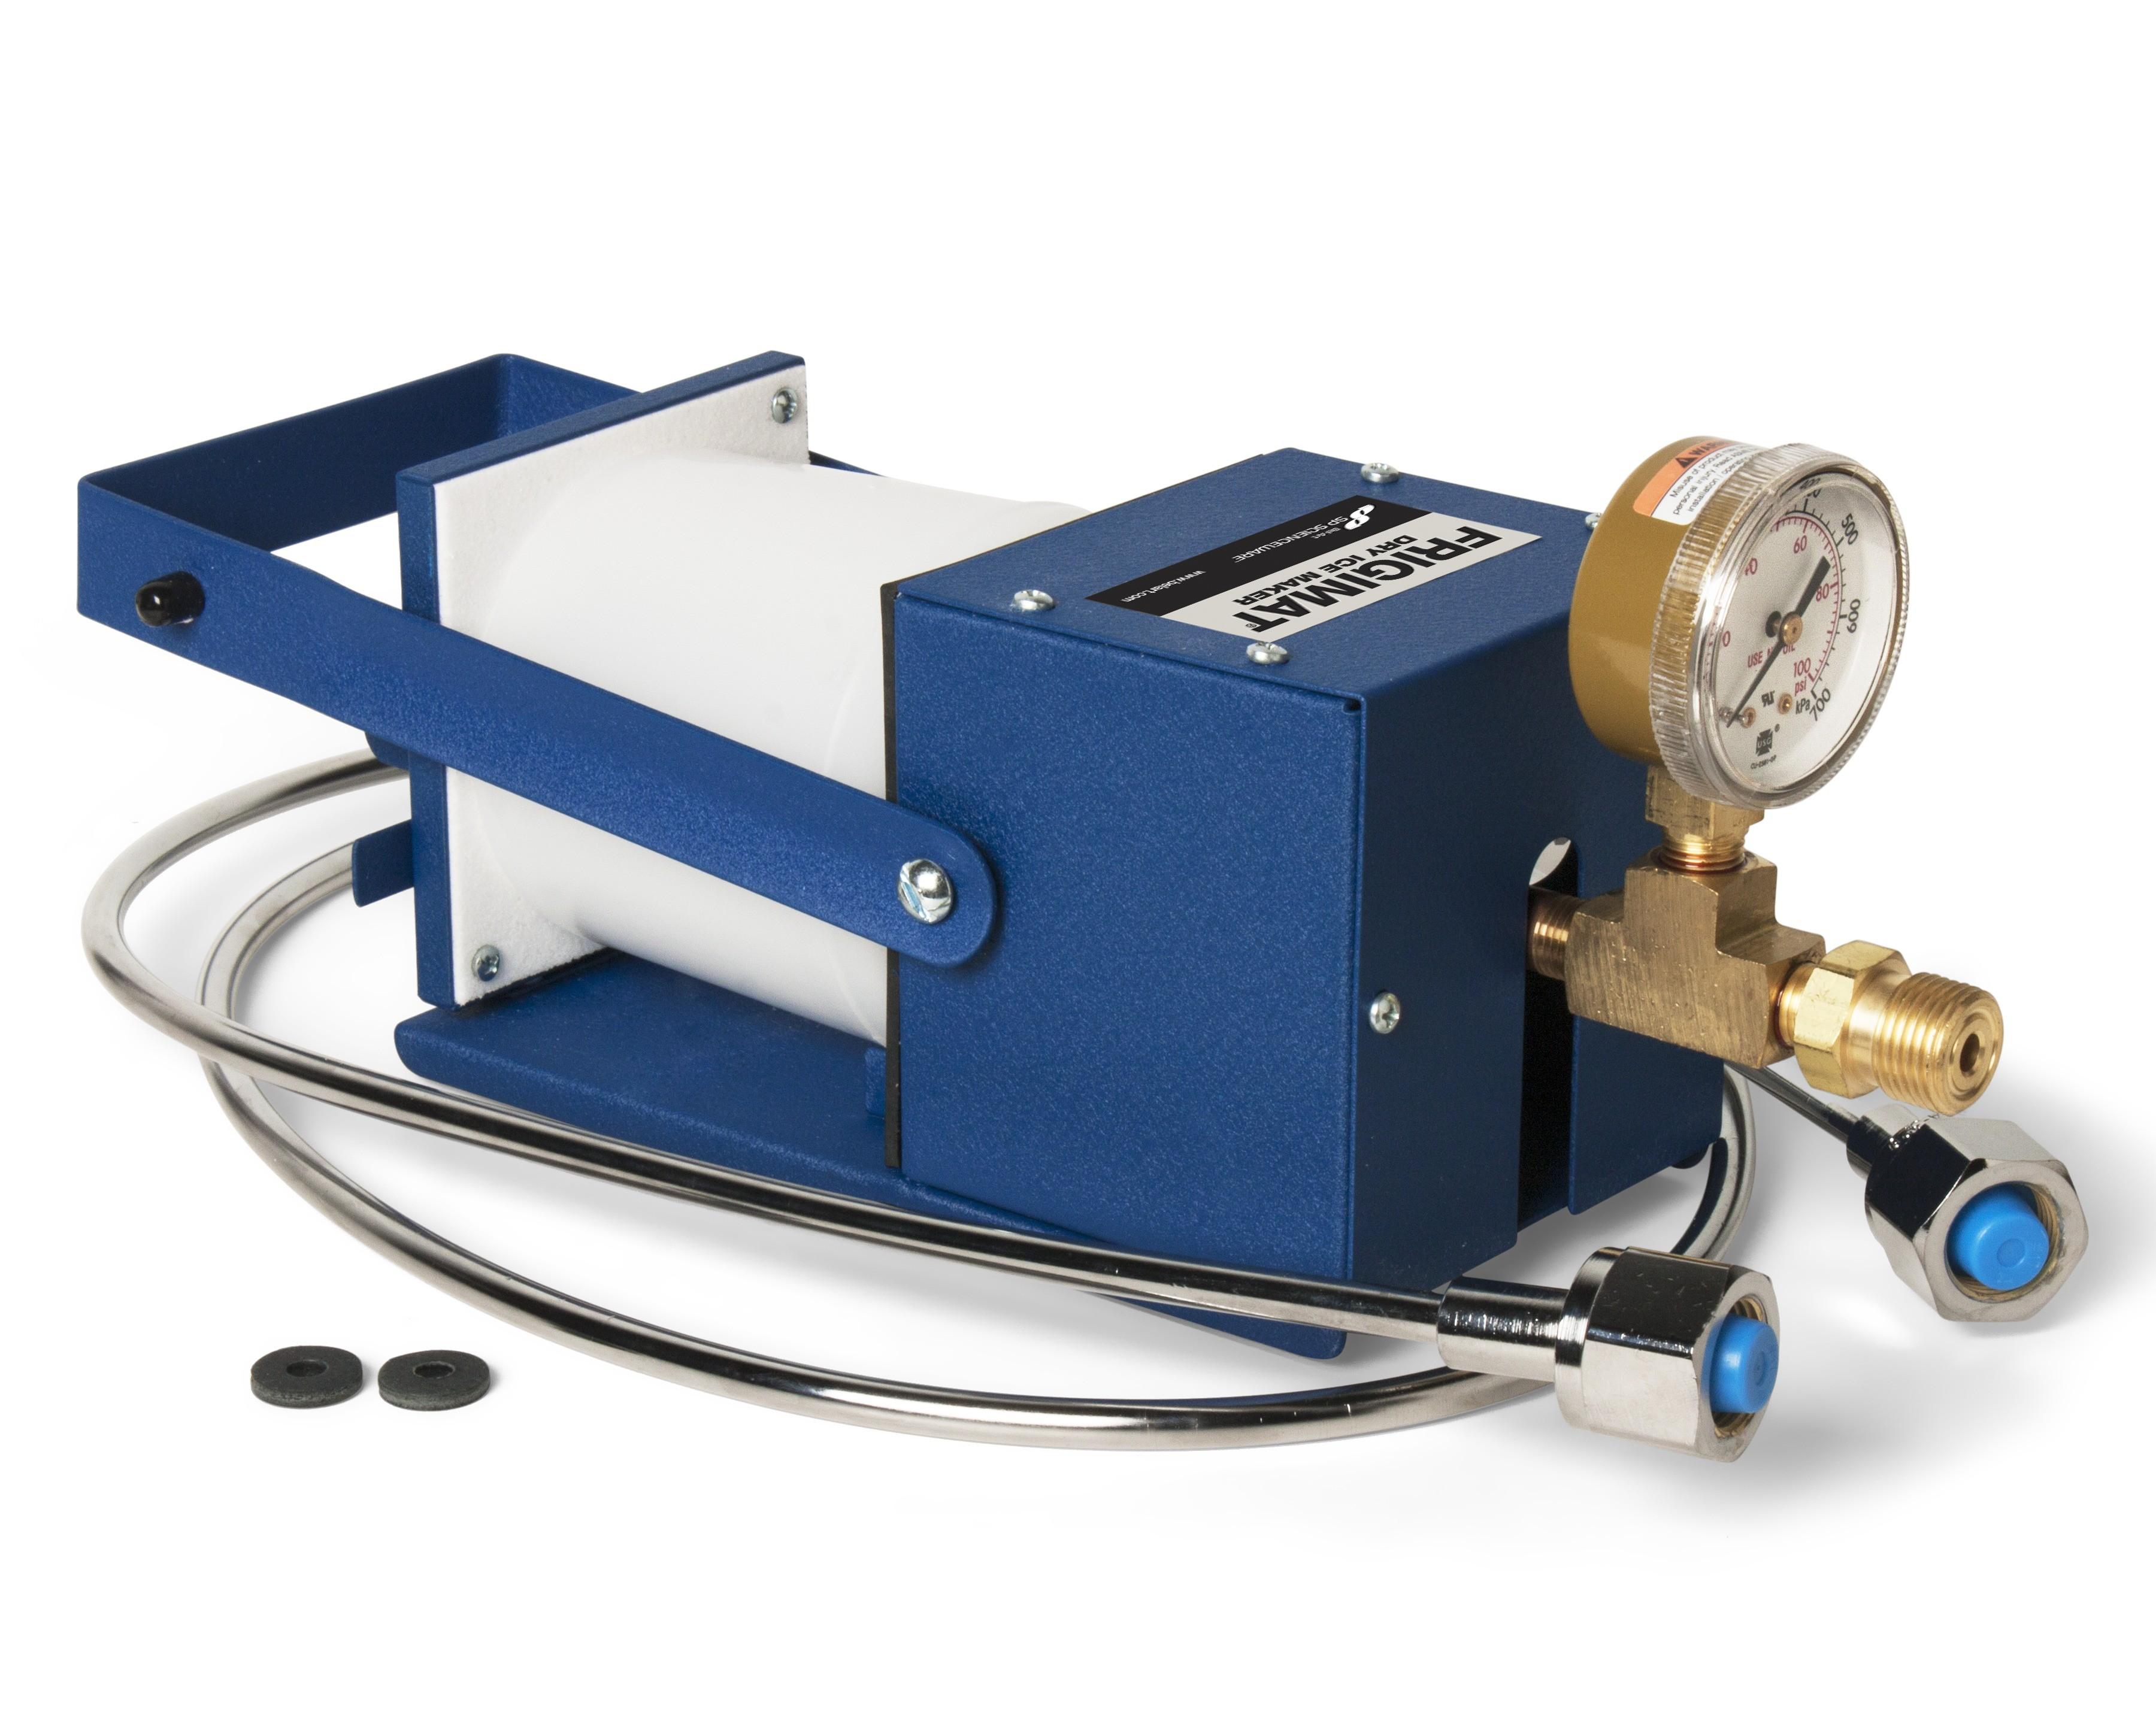 SP Bel-Art Economy Frigimat Dry Ice Maker; U.S. Model, 14¾ x 5½ x 6 in.